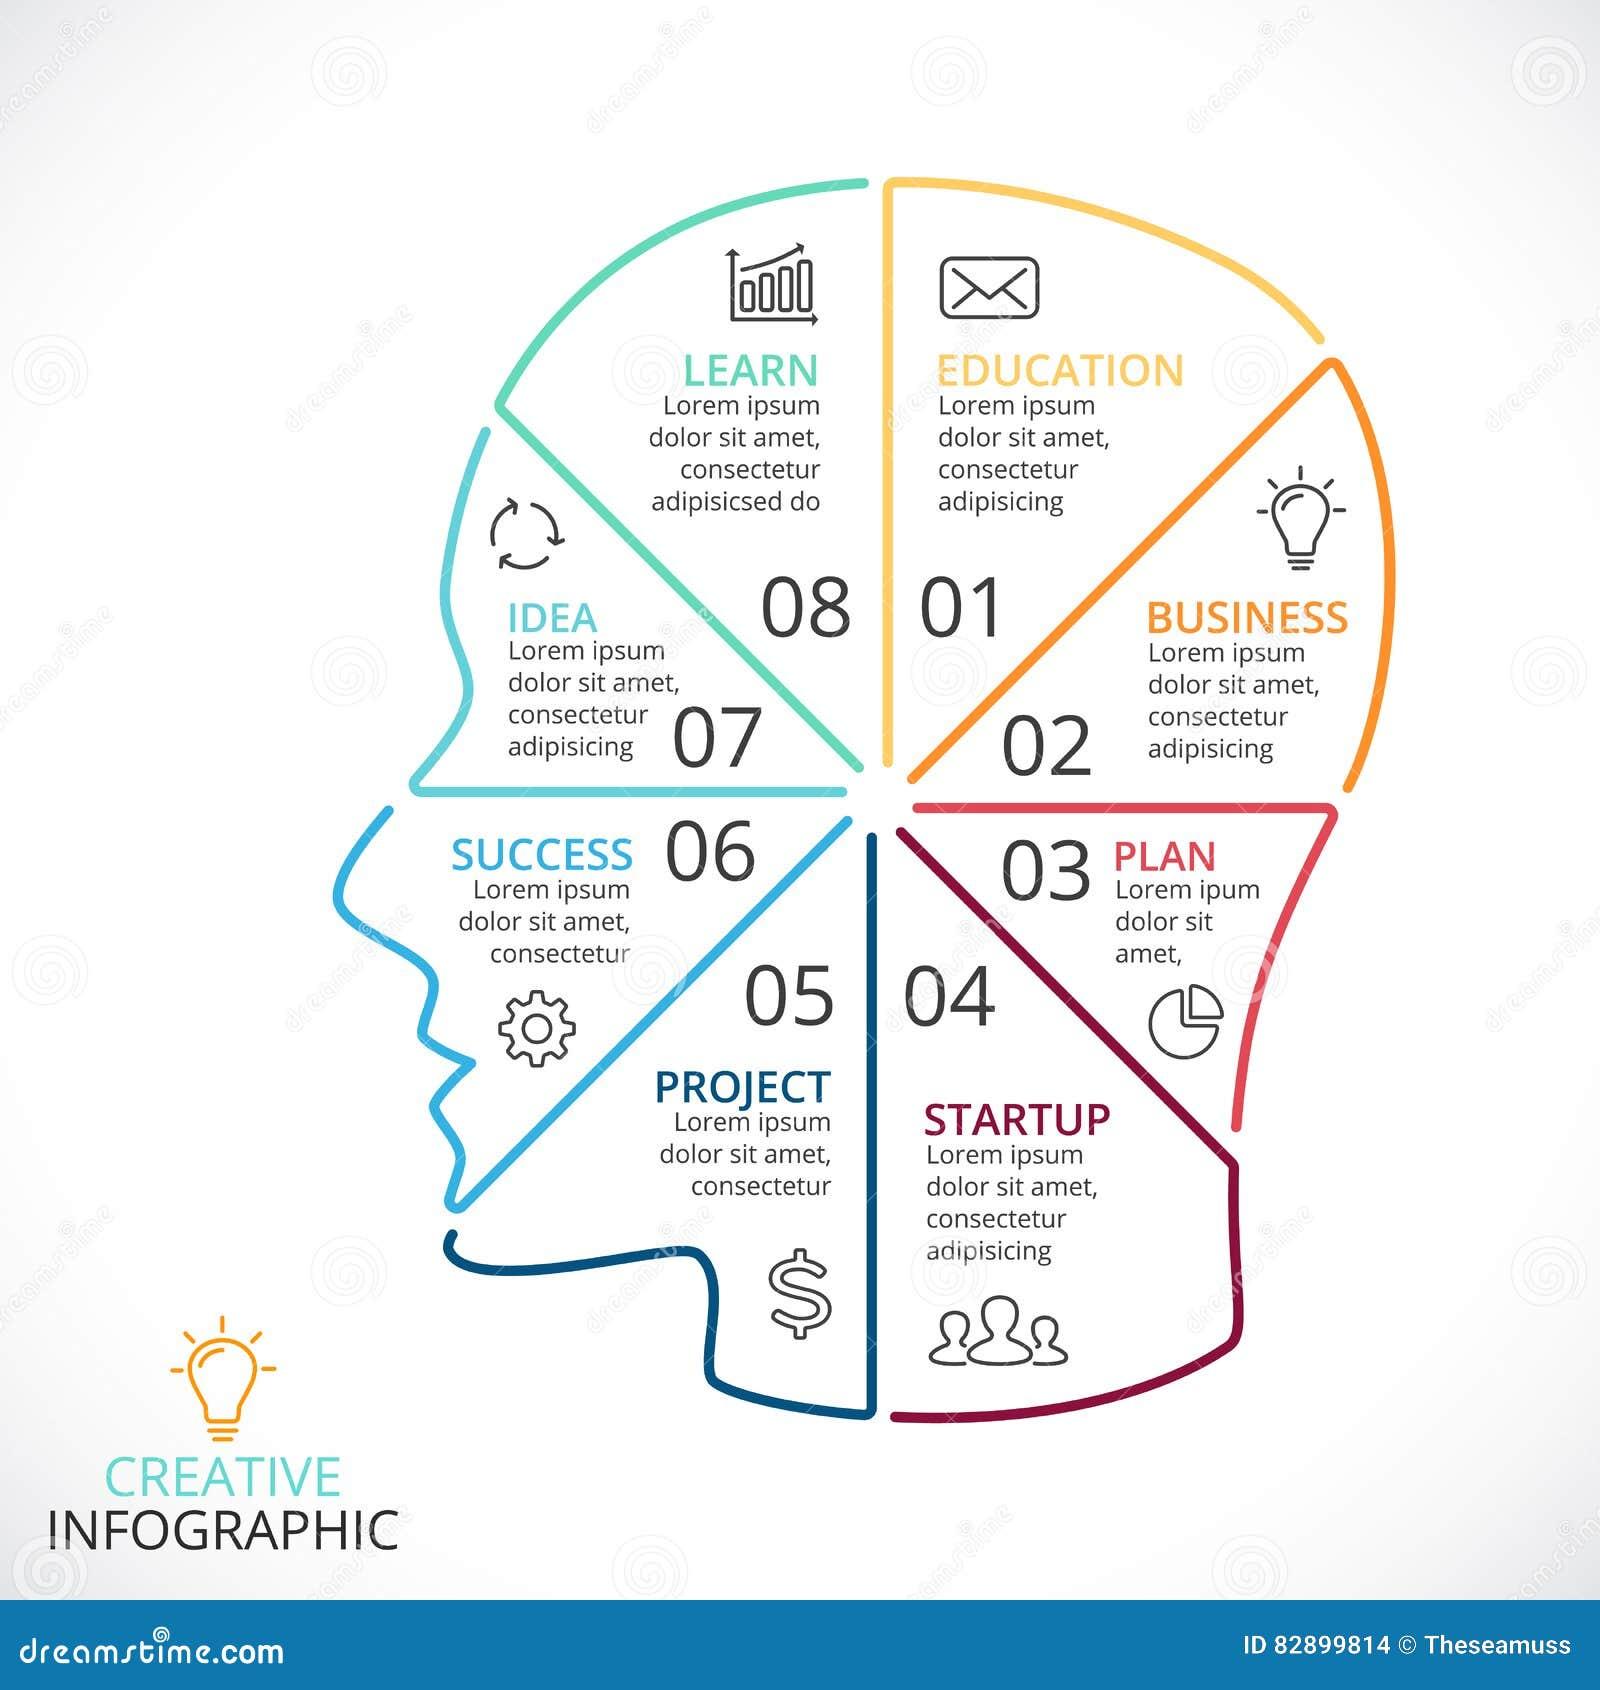 Business Plan Startup Template Pasoevolistco - Business plan startup template